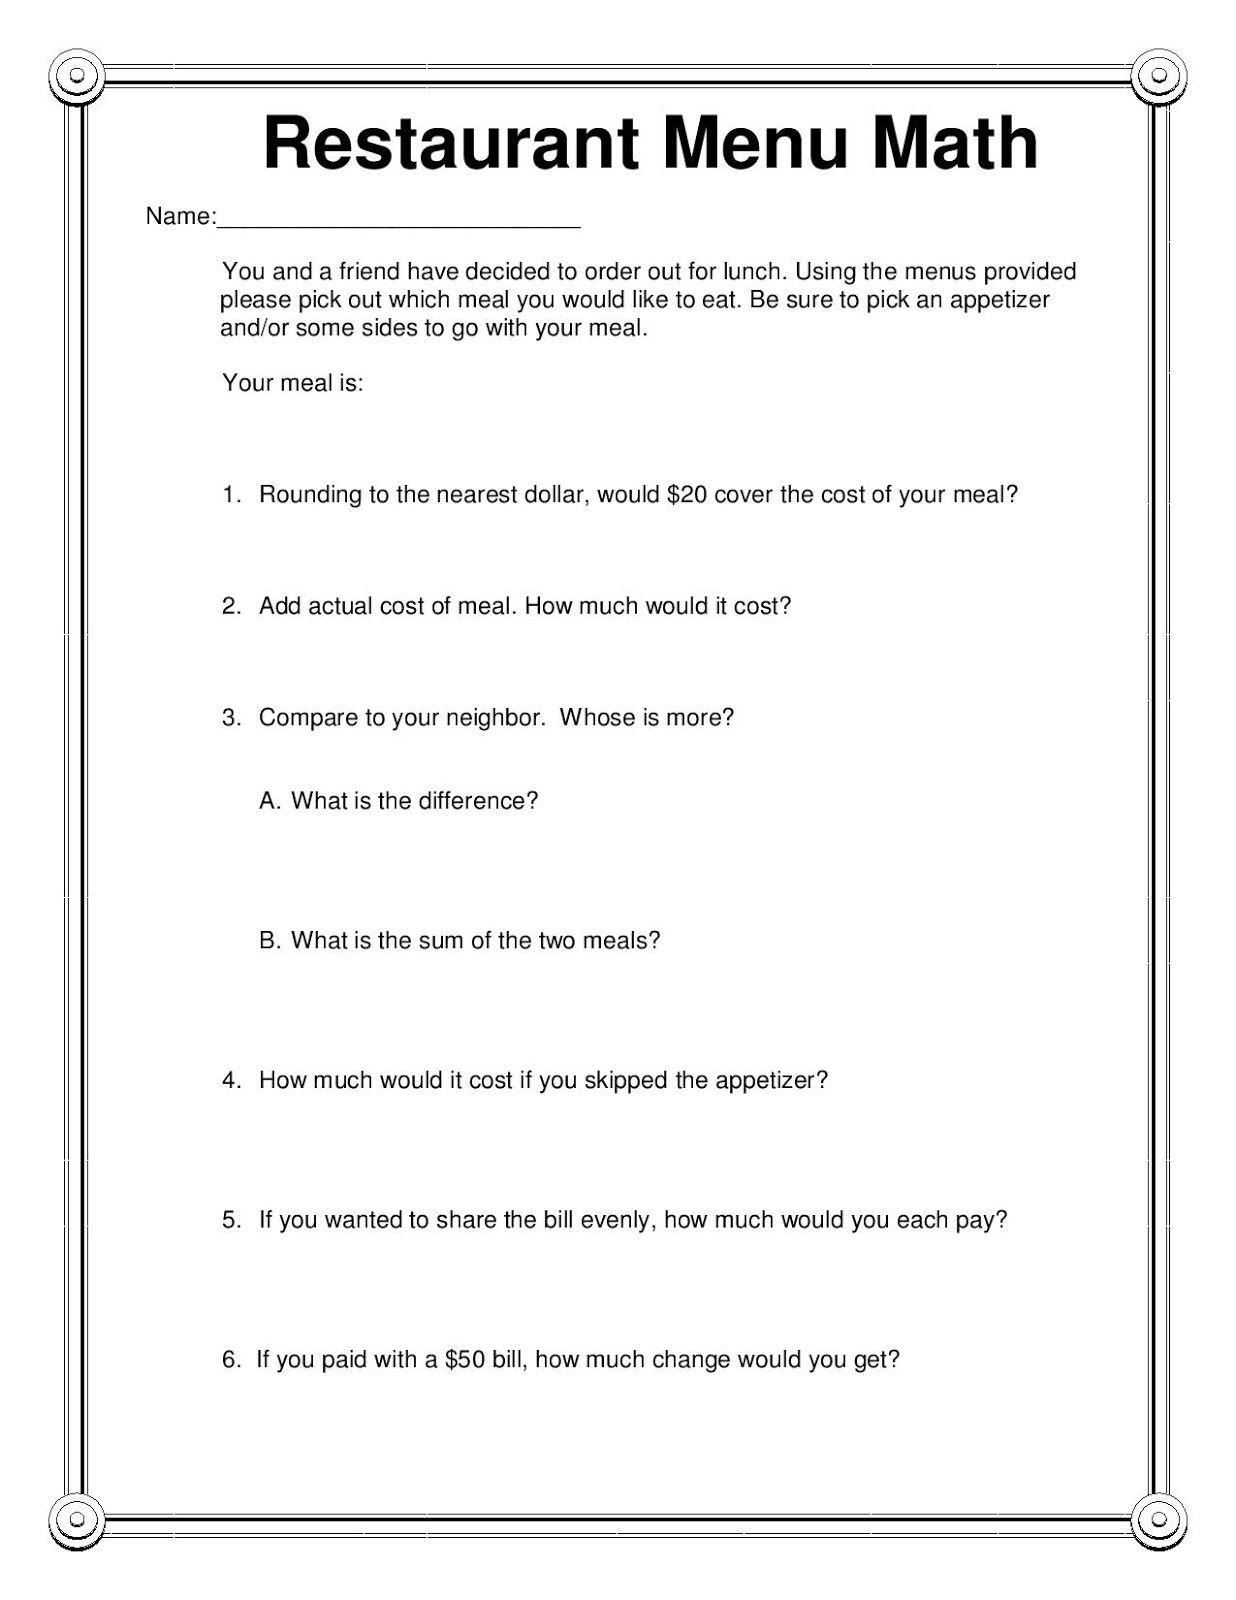 Menu Math Worksheets Printable Manic Monday Restaurant Menu Math Freebie